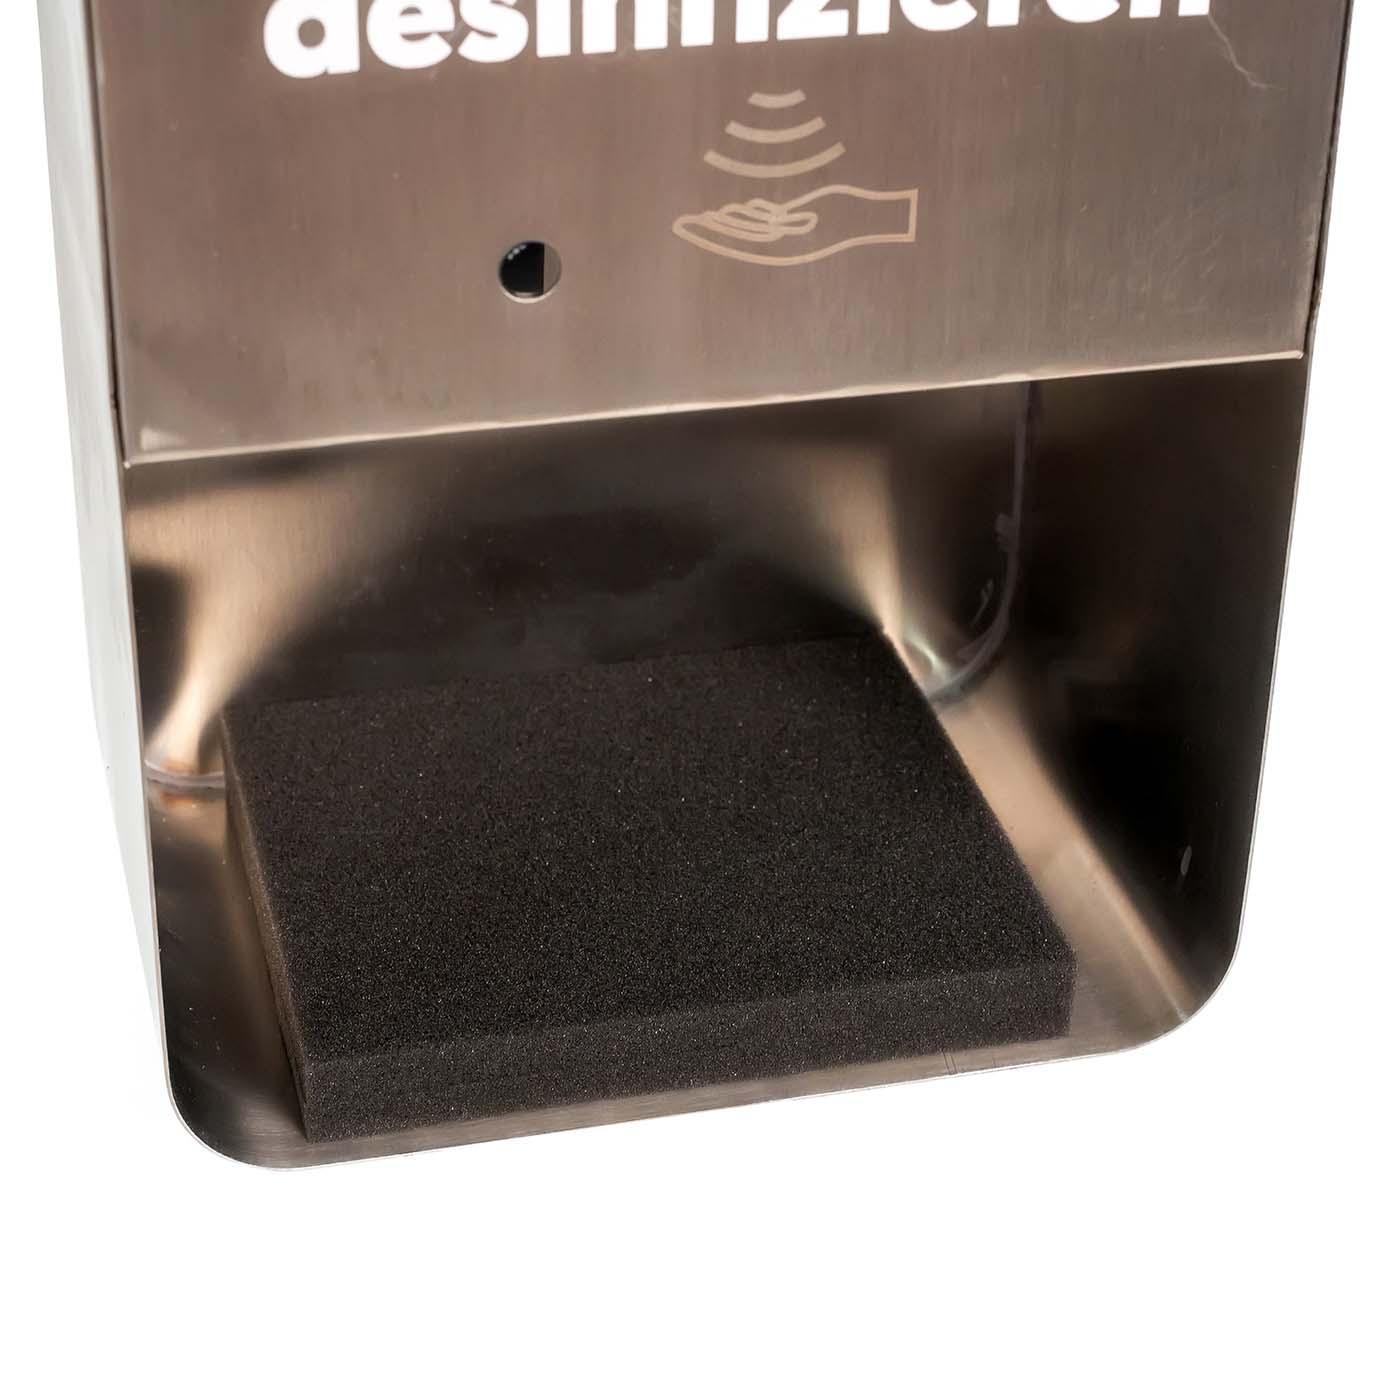 SANIC Edelstahl Wand-Desinfektionsstation mit Sensor